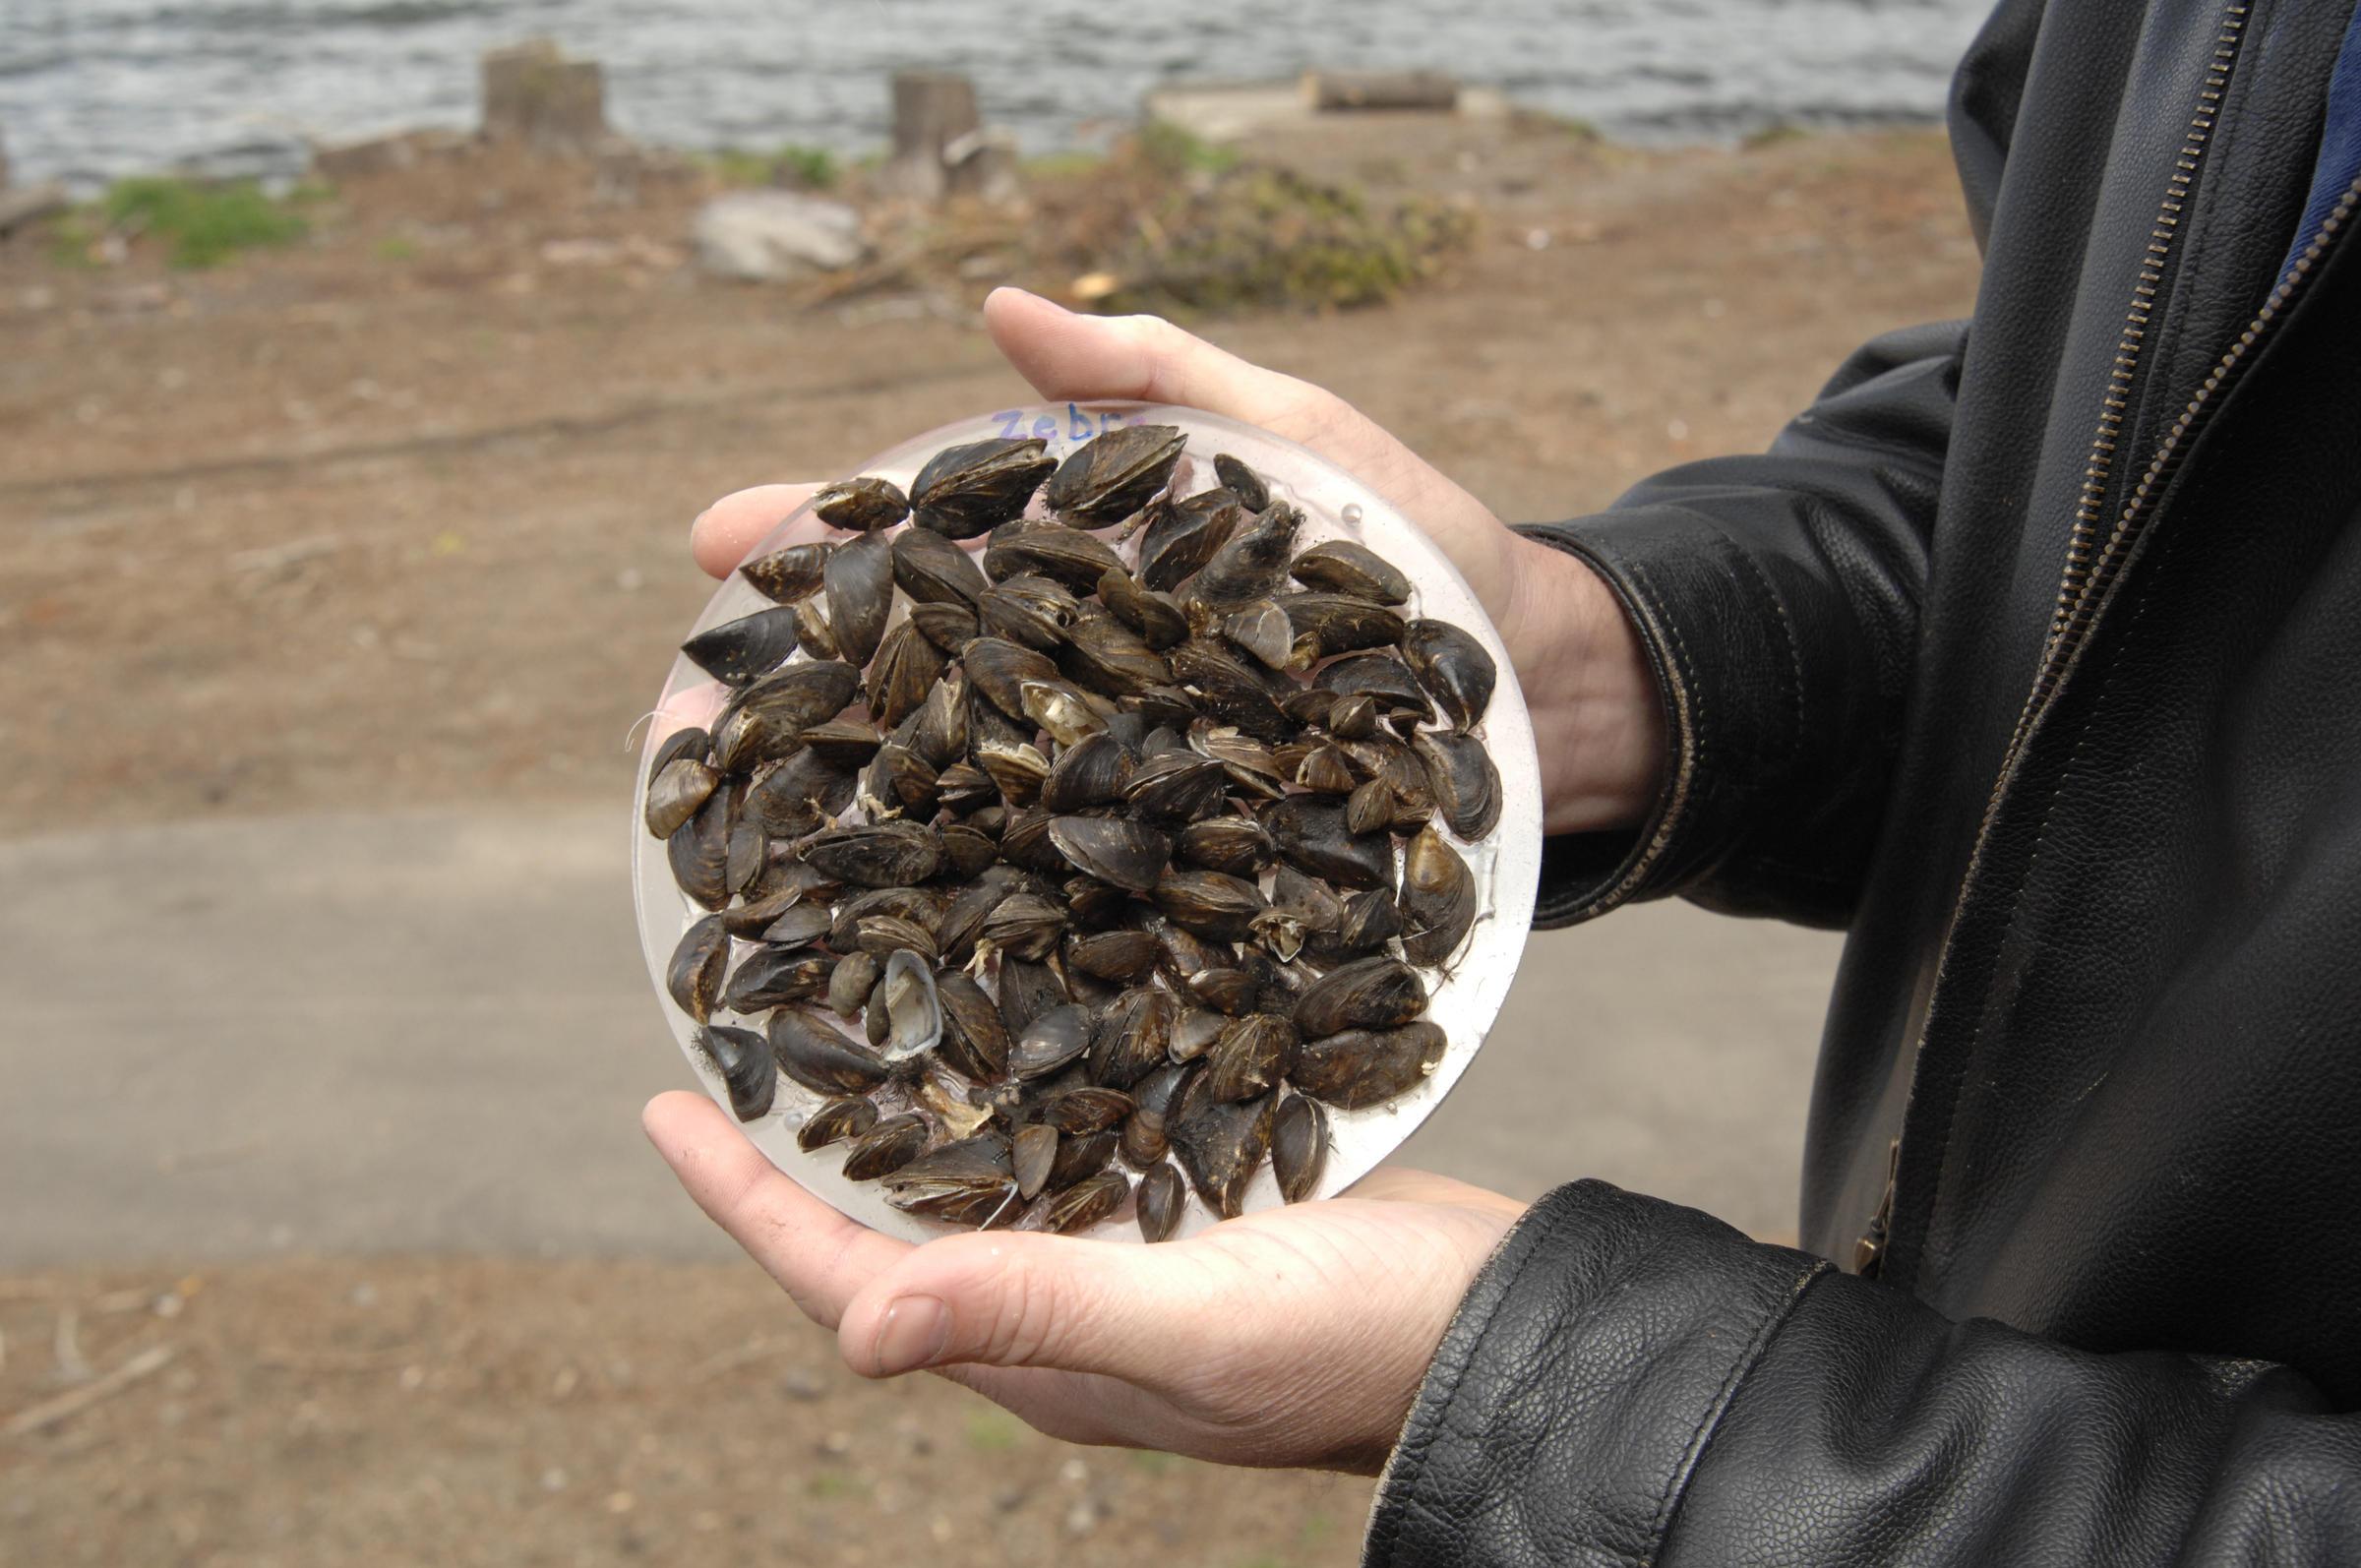 Prevent the Spread of Aquatic Invasive Species